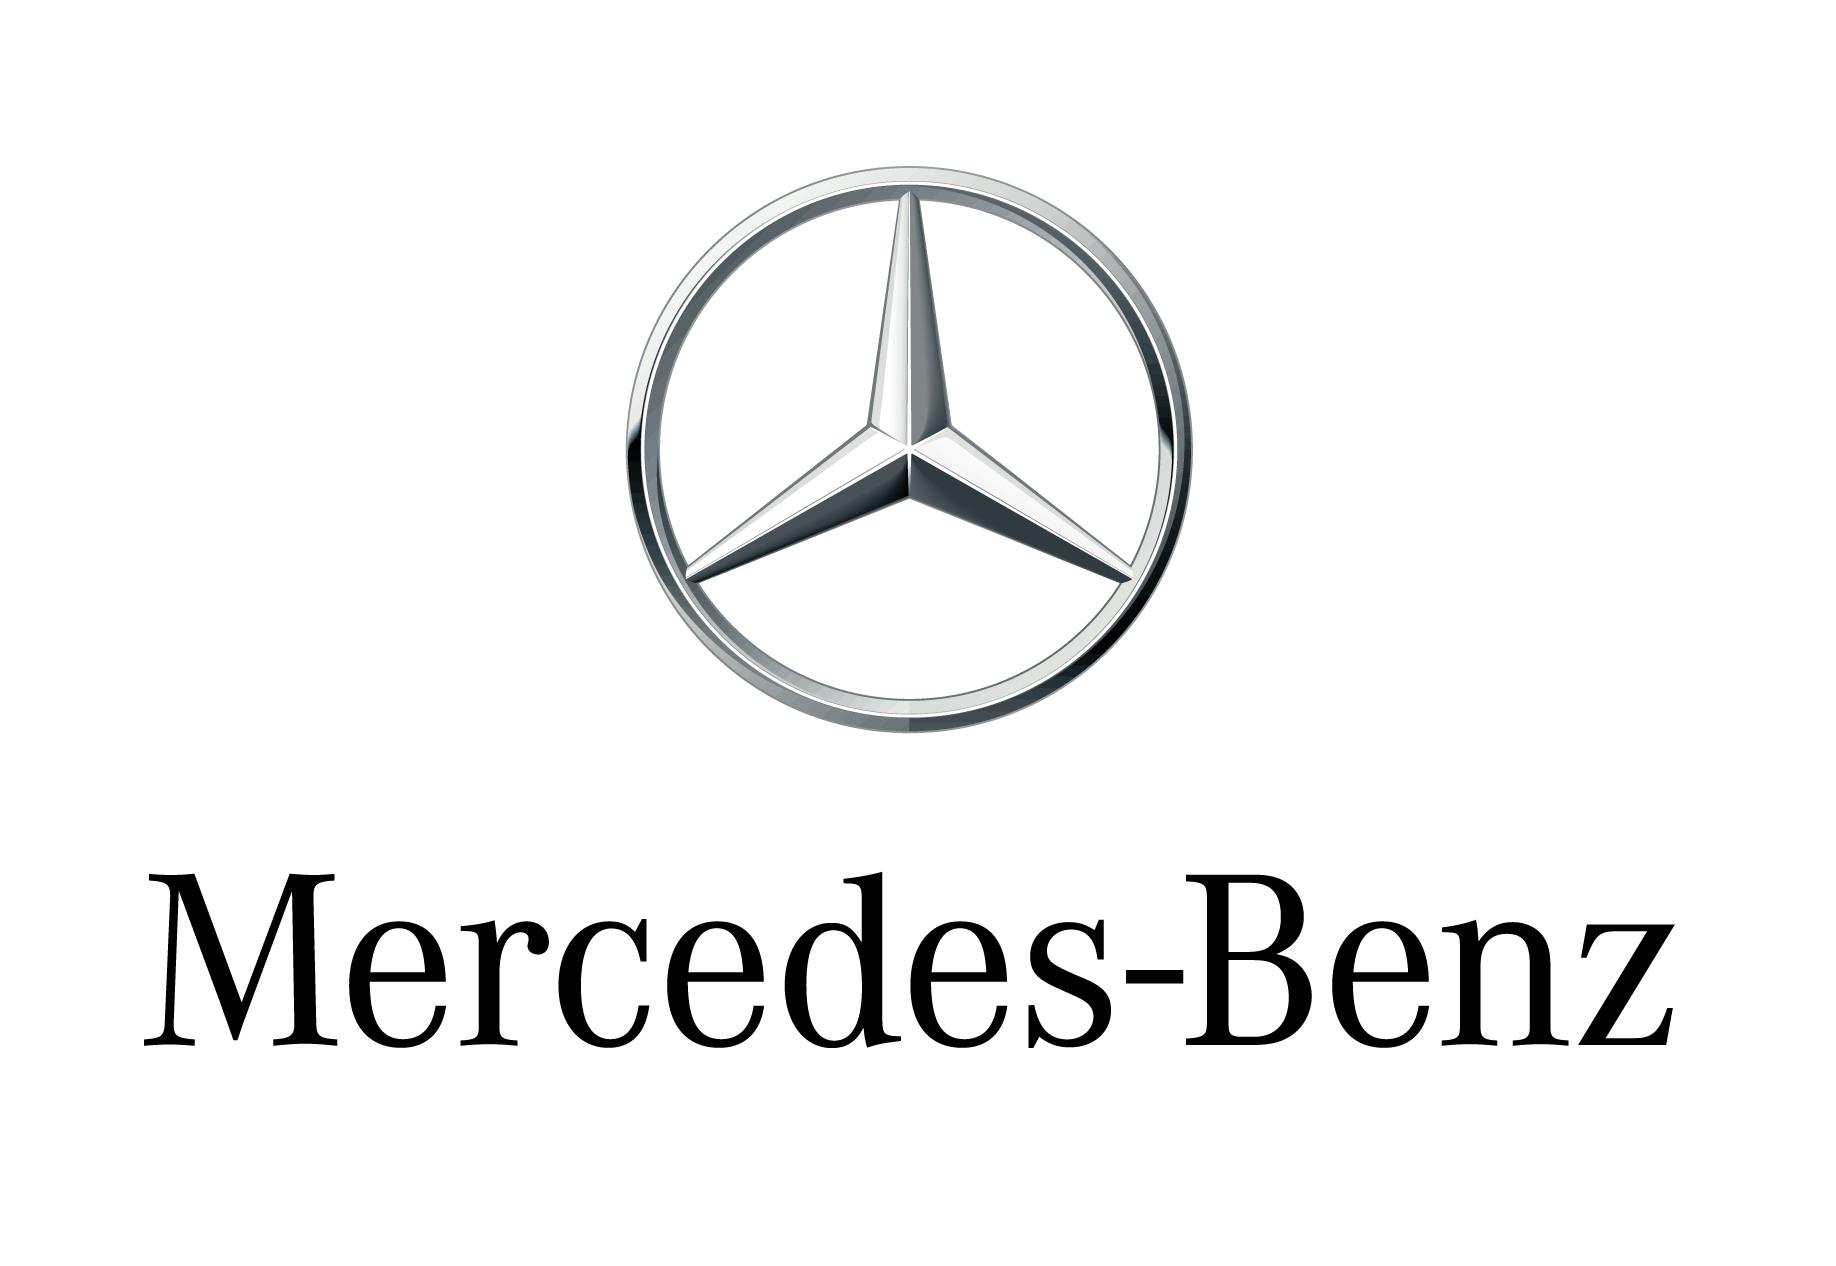 a case study of mercedes benz